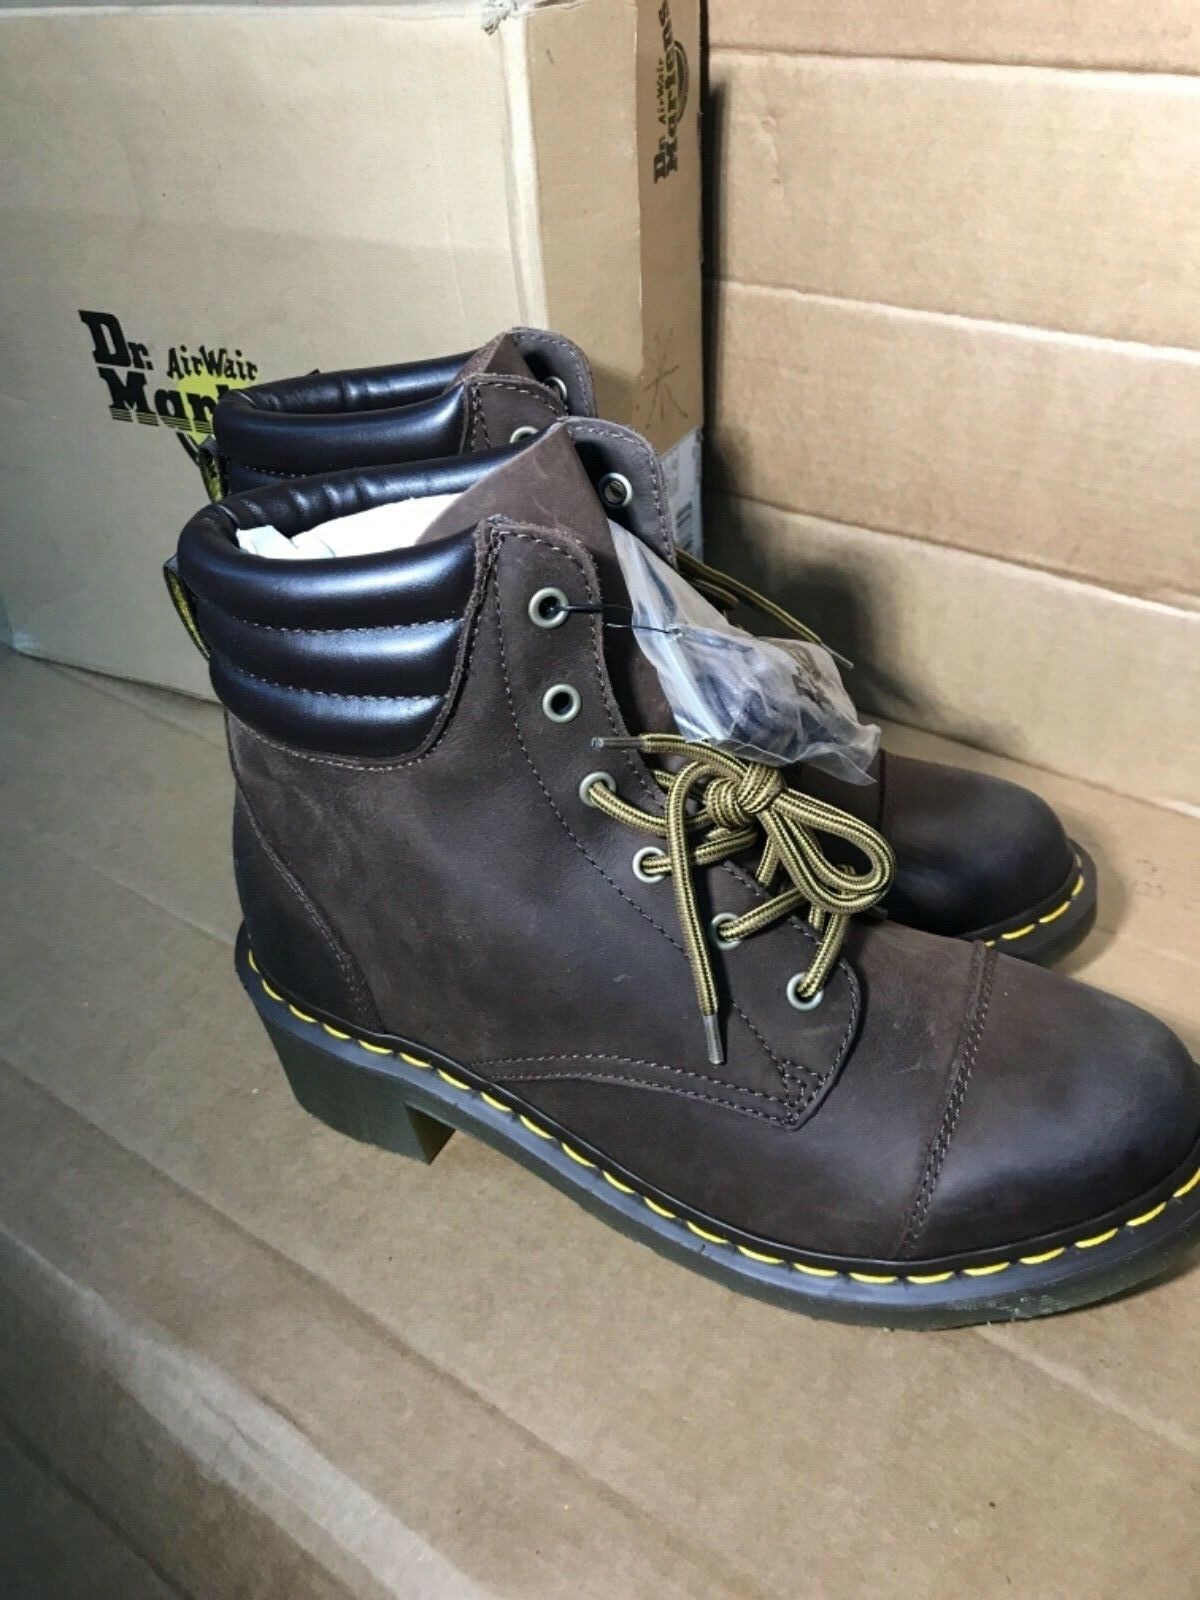 Dr. Martens air wair Braun boots Damens's Größe 11